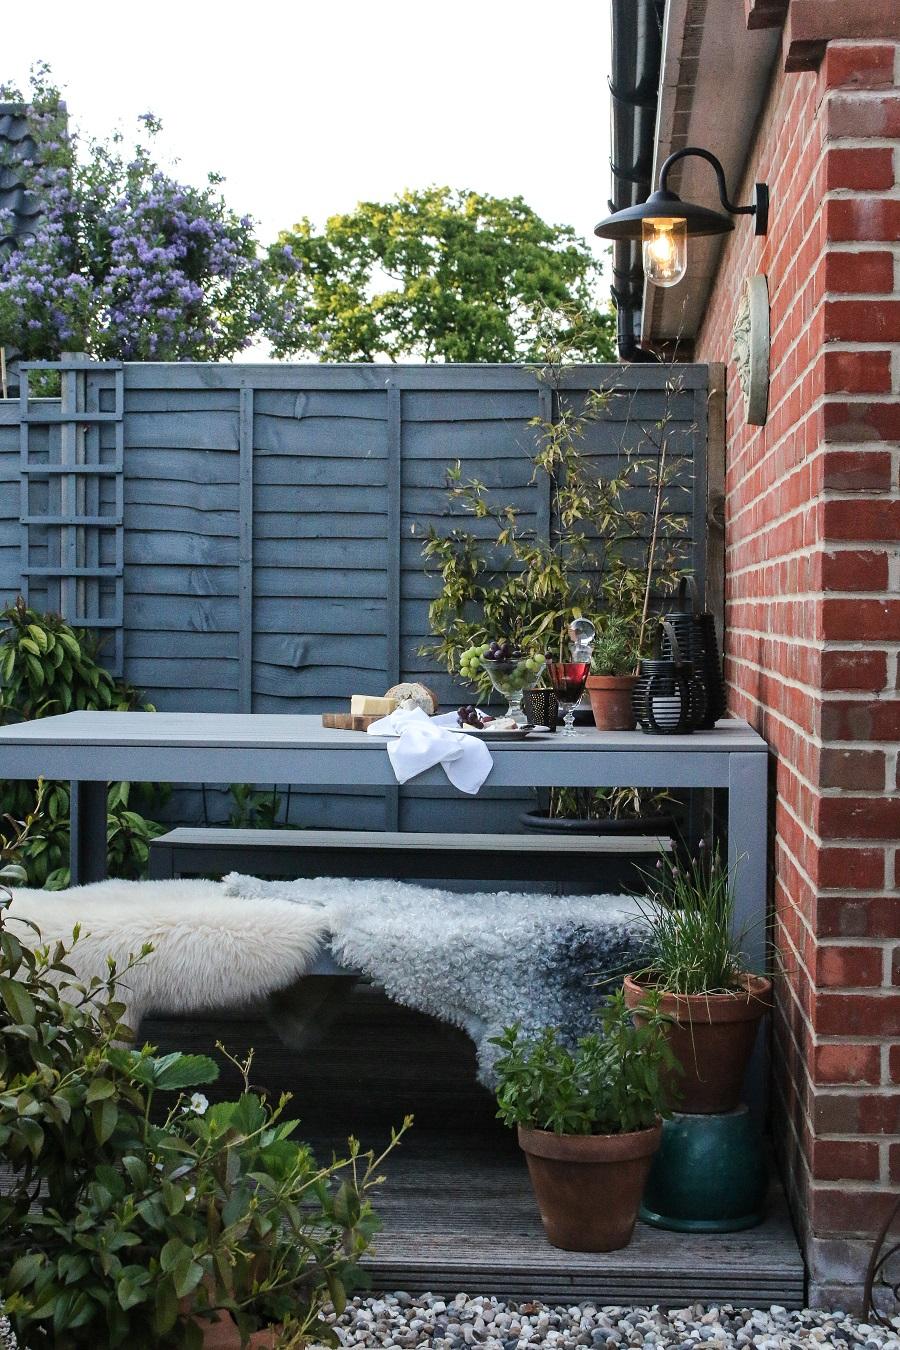 Create 'zones' within your garden